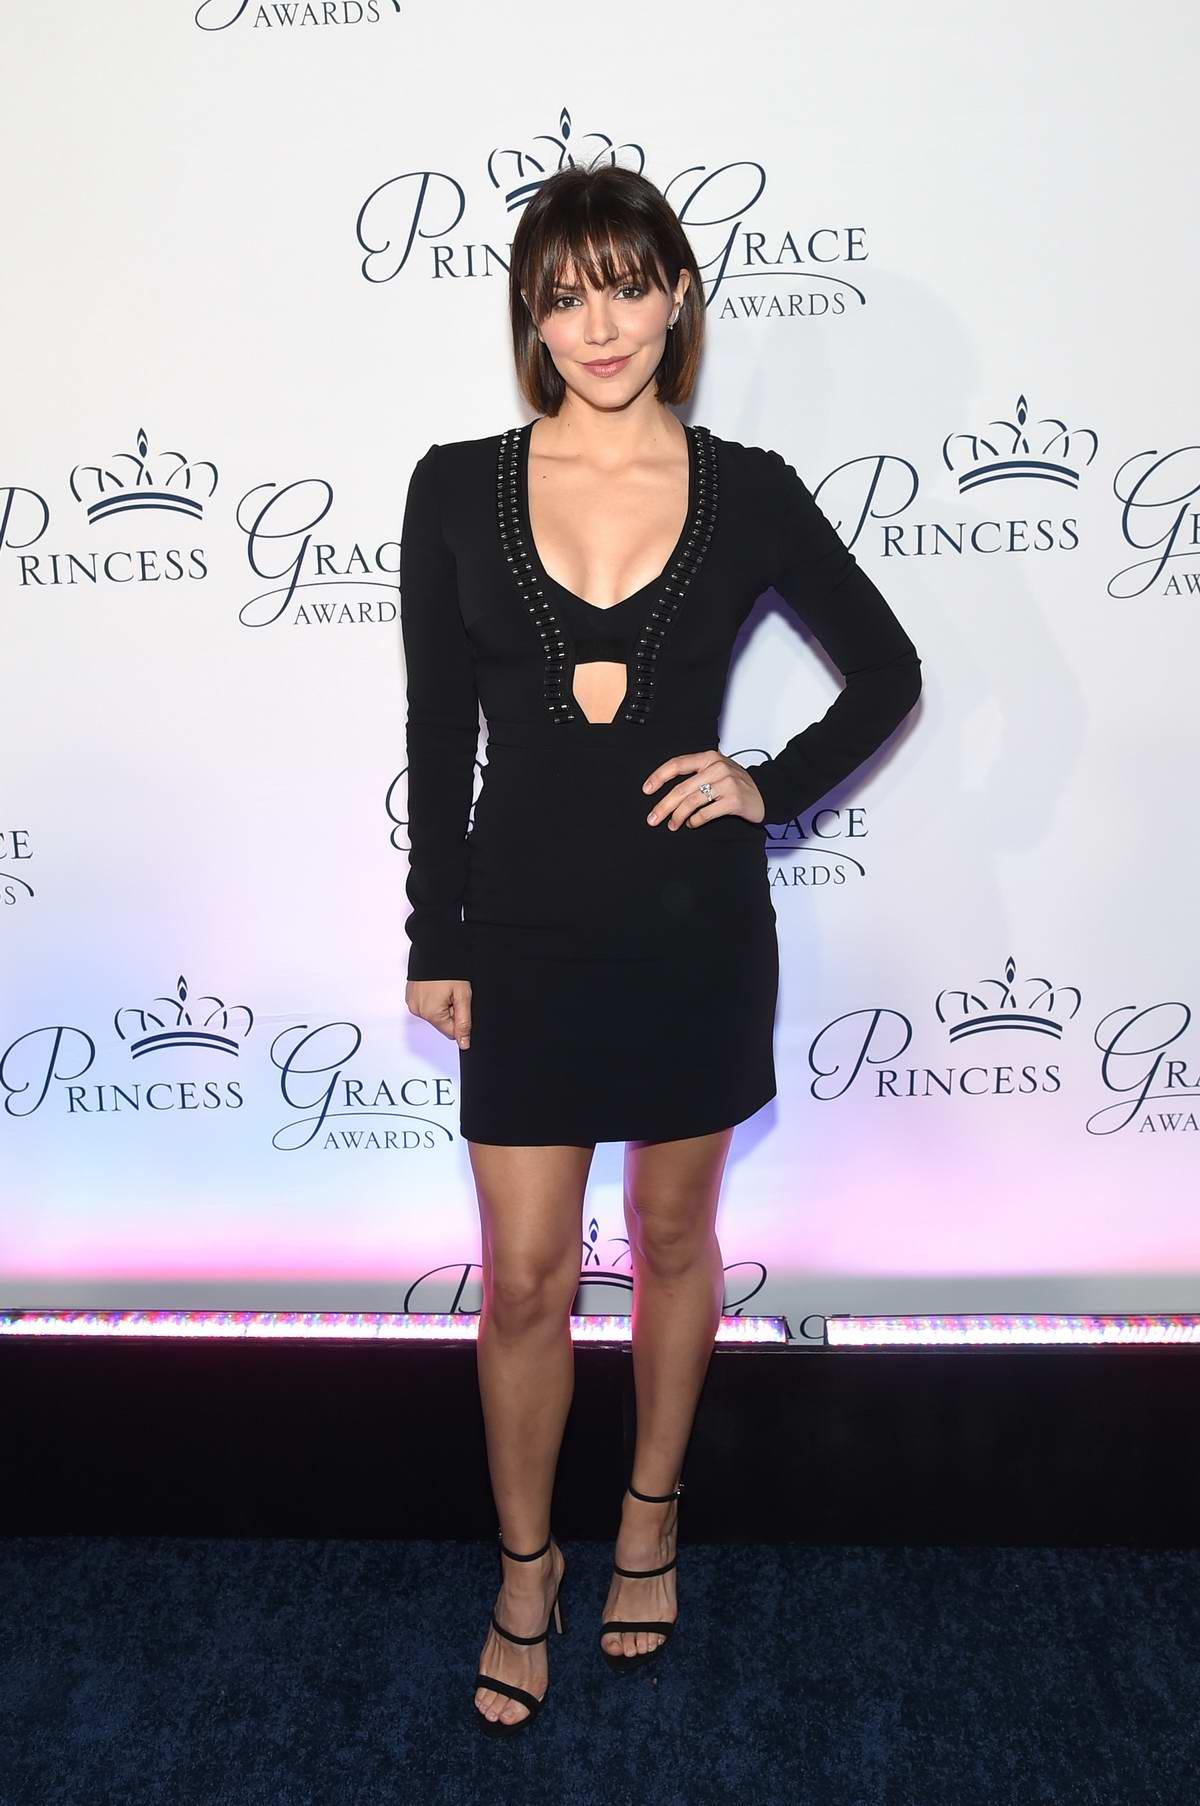 Katharine McPhee attends 2018 Princess Grace Awards Gala at Cipriani 25 Broadway in New York City